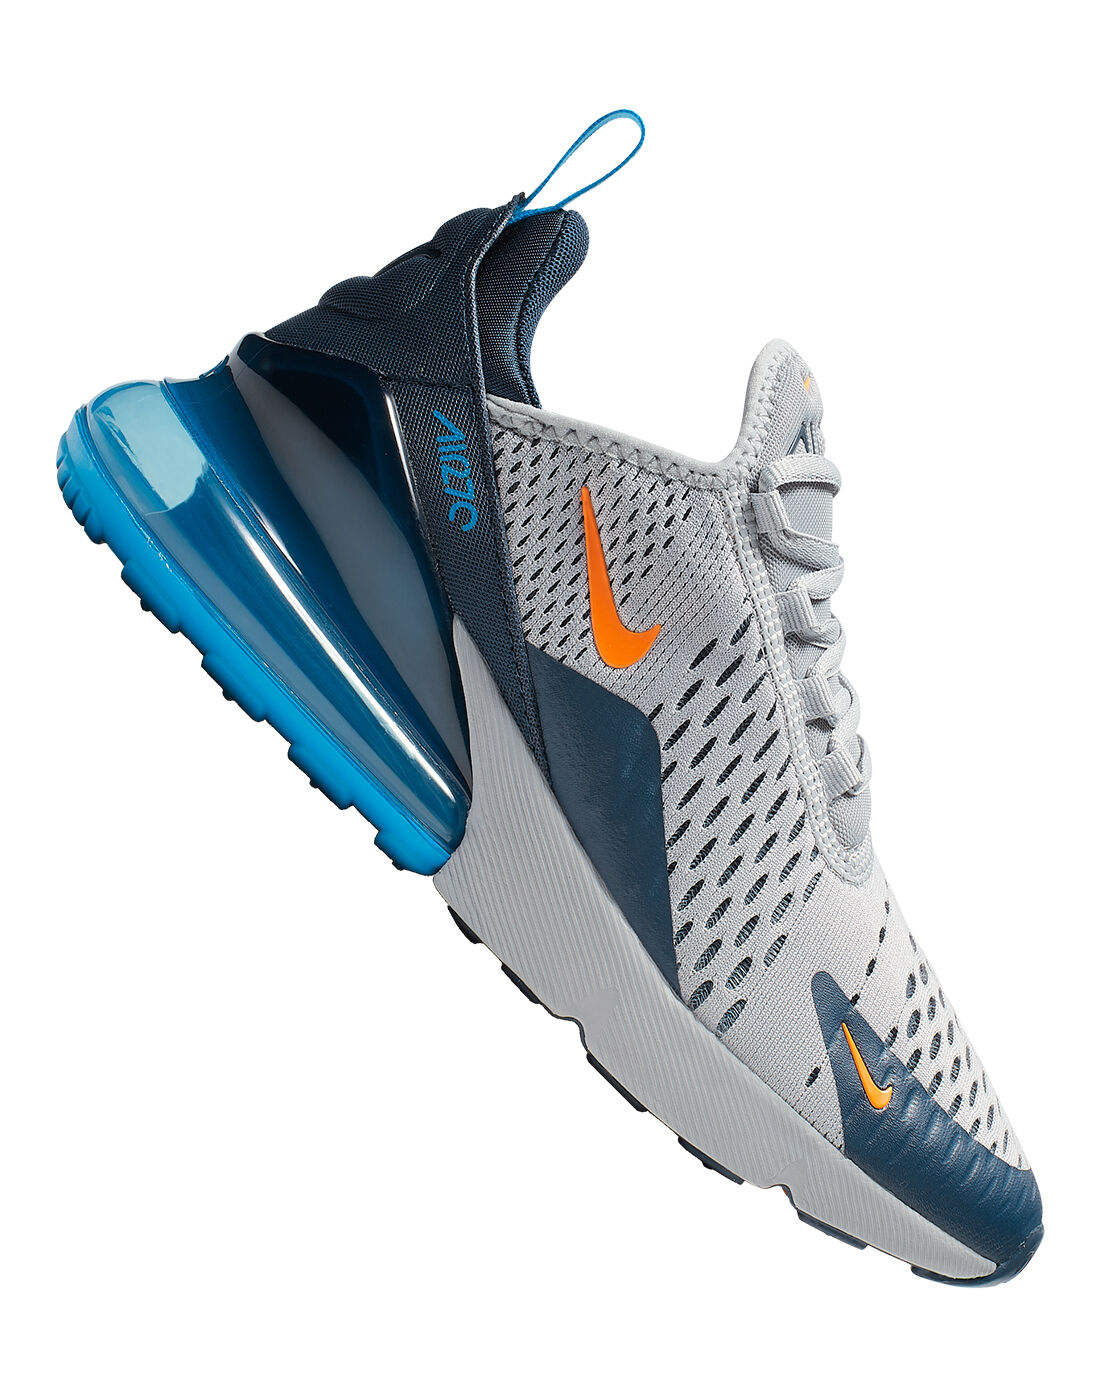 nike air max 270 grey blue and orange